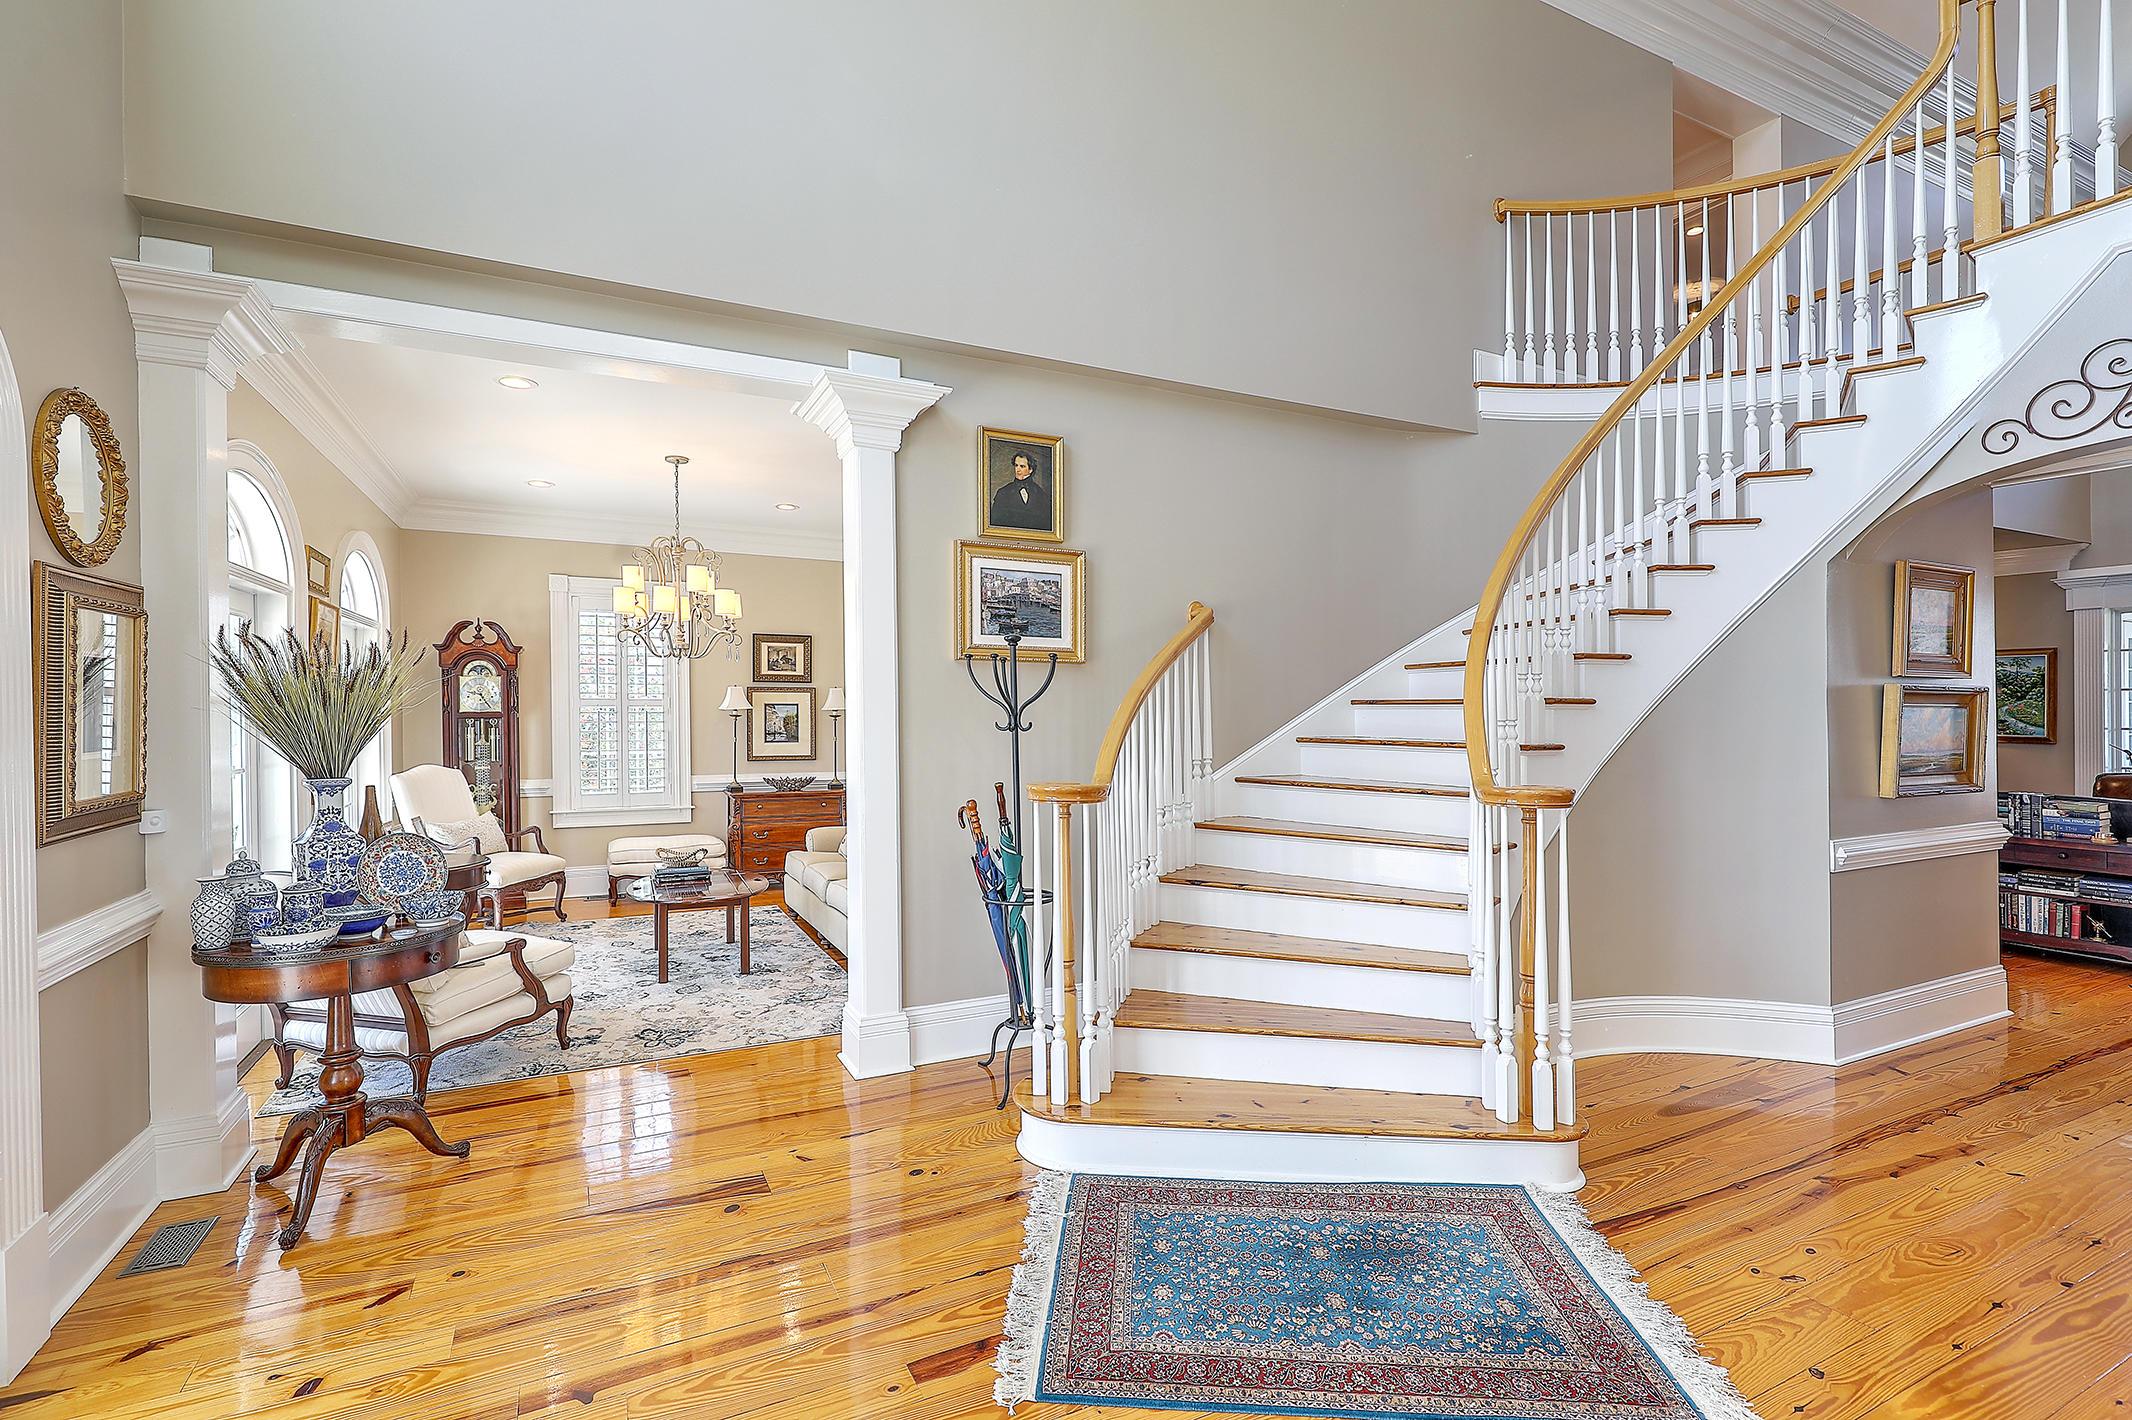 Beresford Creek Landing Homes For Sale - 1410 Creek House, Charleston, SC - 57